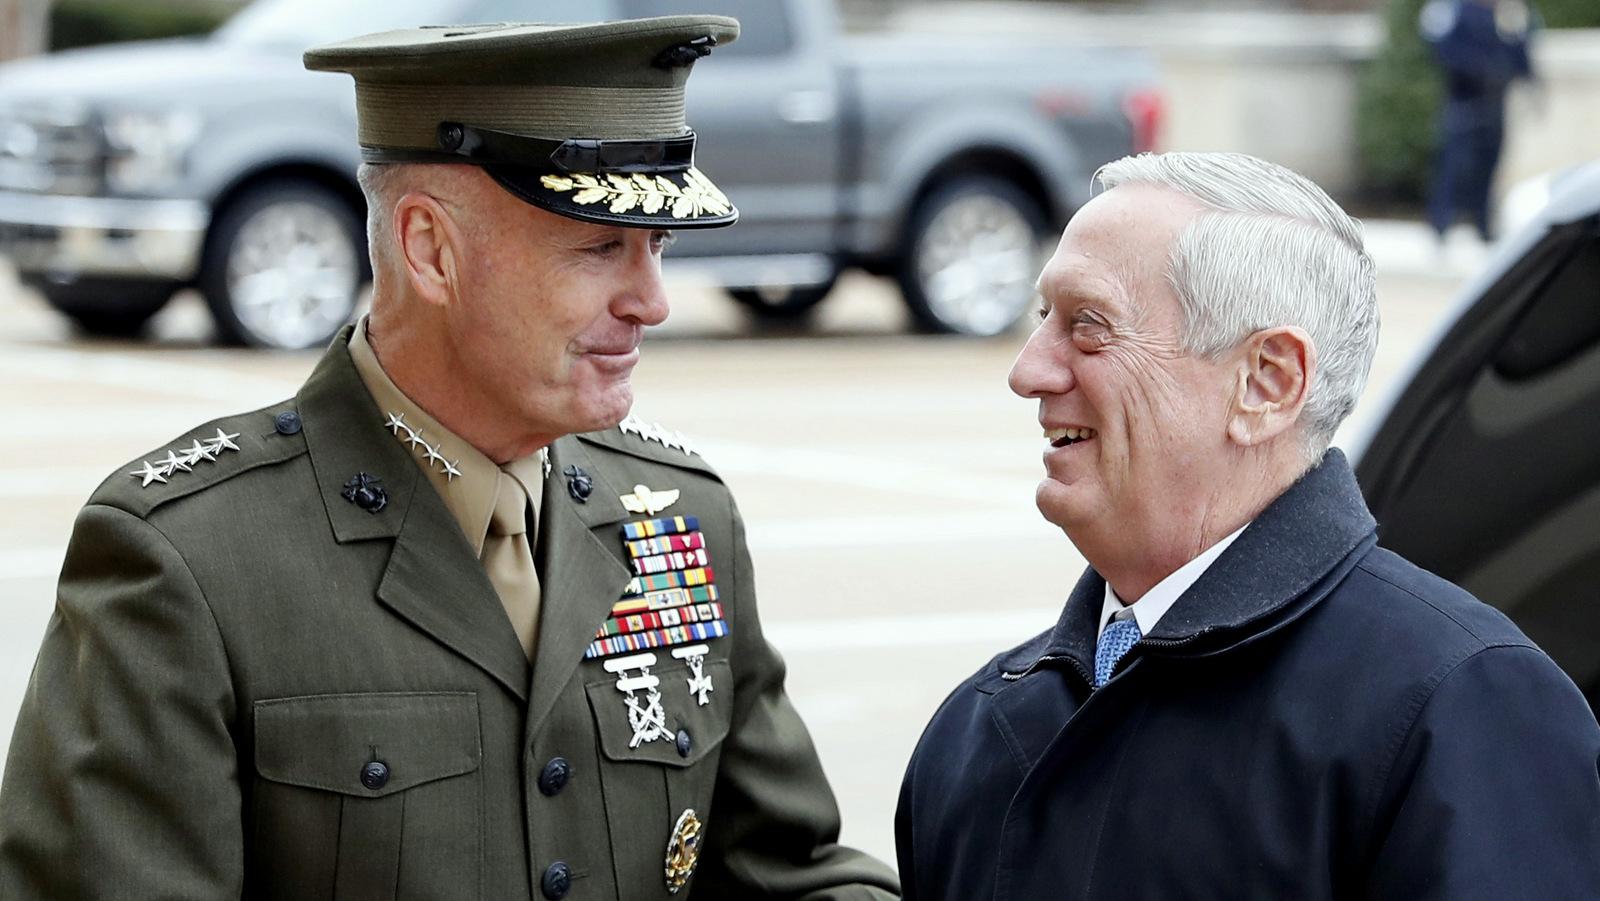 Joint Chiefs Chairman Gen. Joseph Dunford greets Defense Secretary James Mattis at the Pentagon (AP/Alex Brandon)